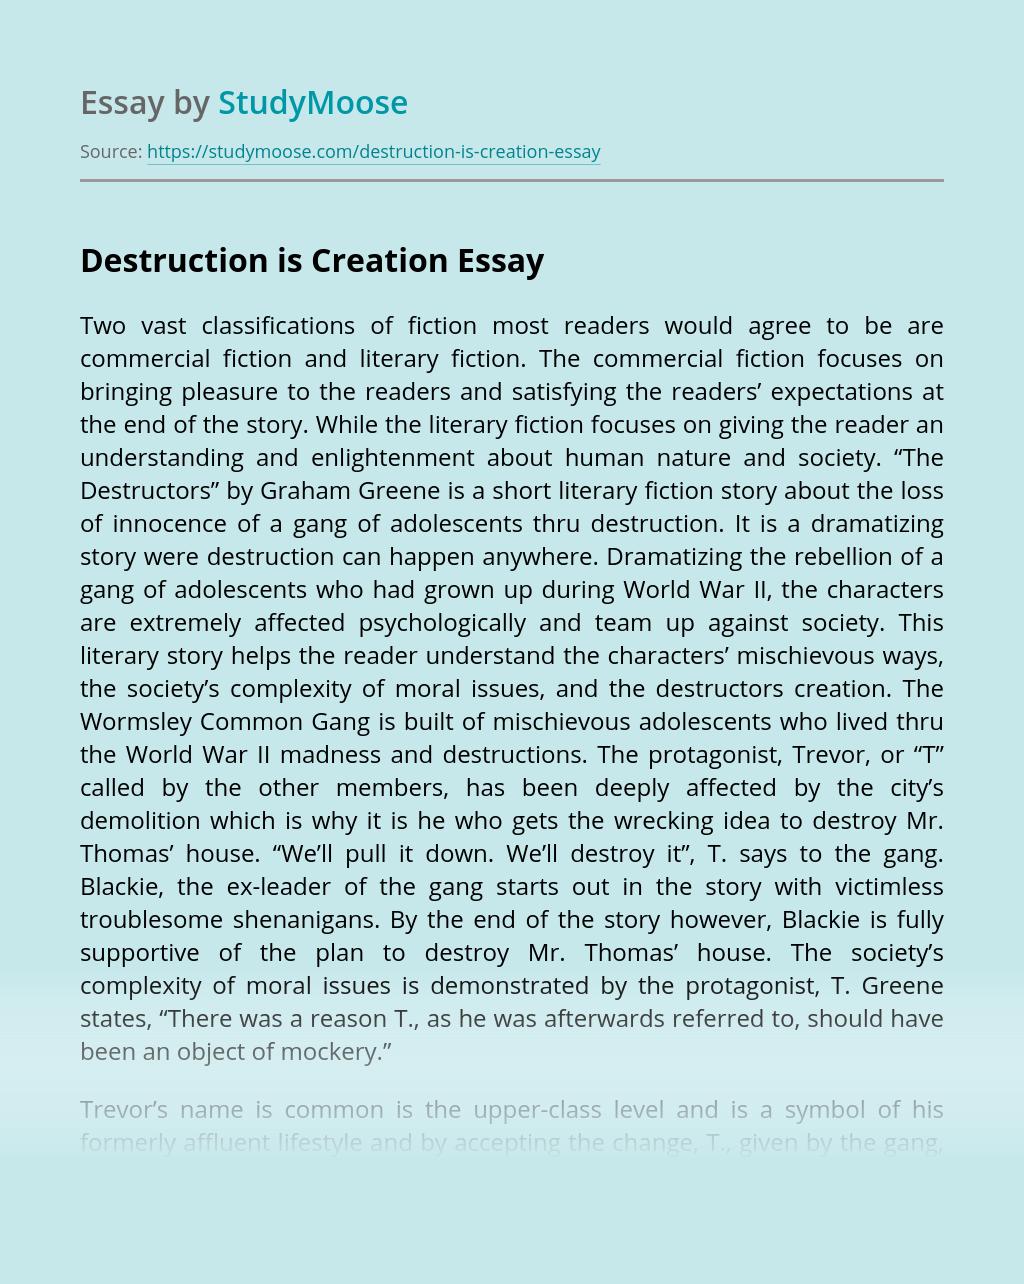 Destruction is Creation